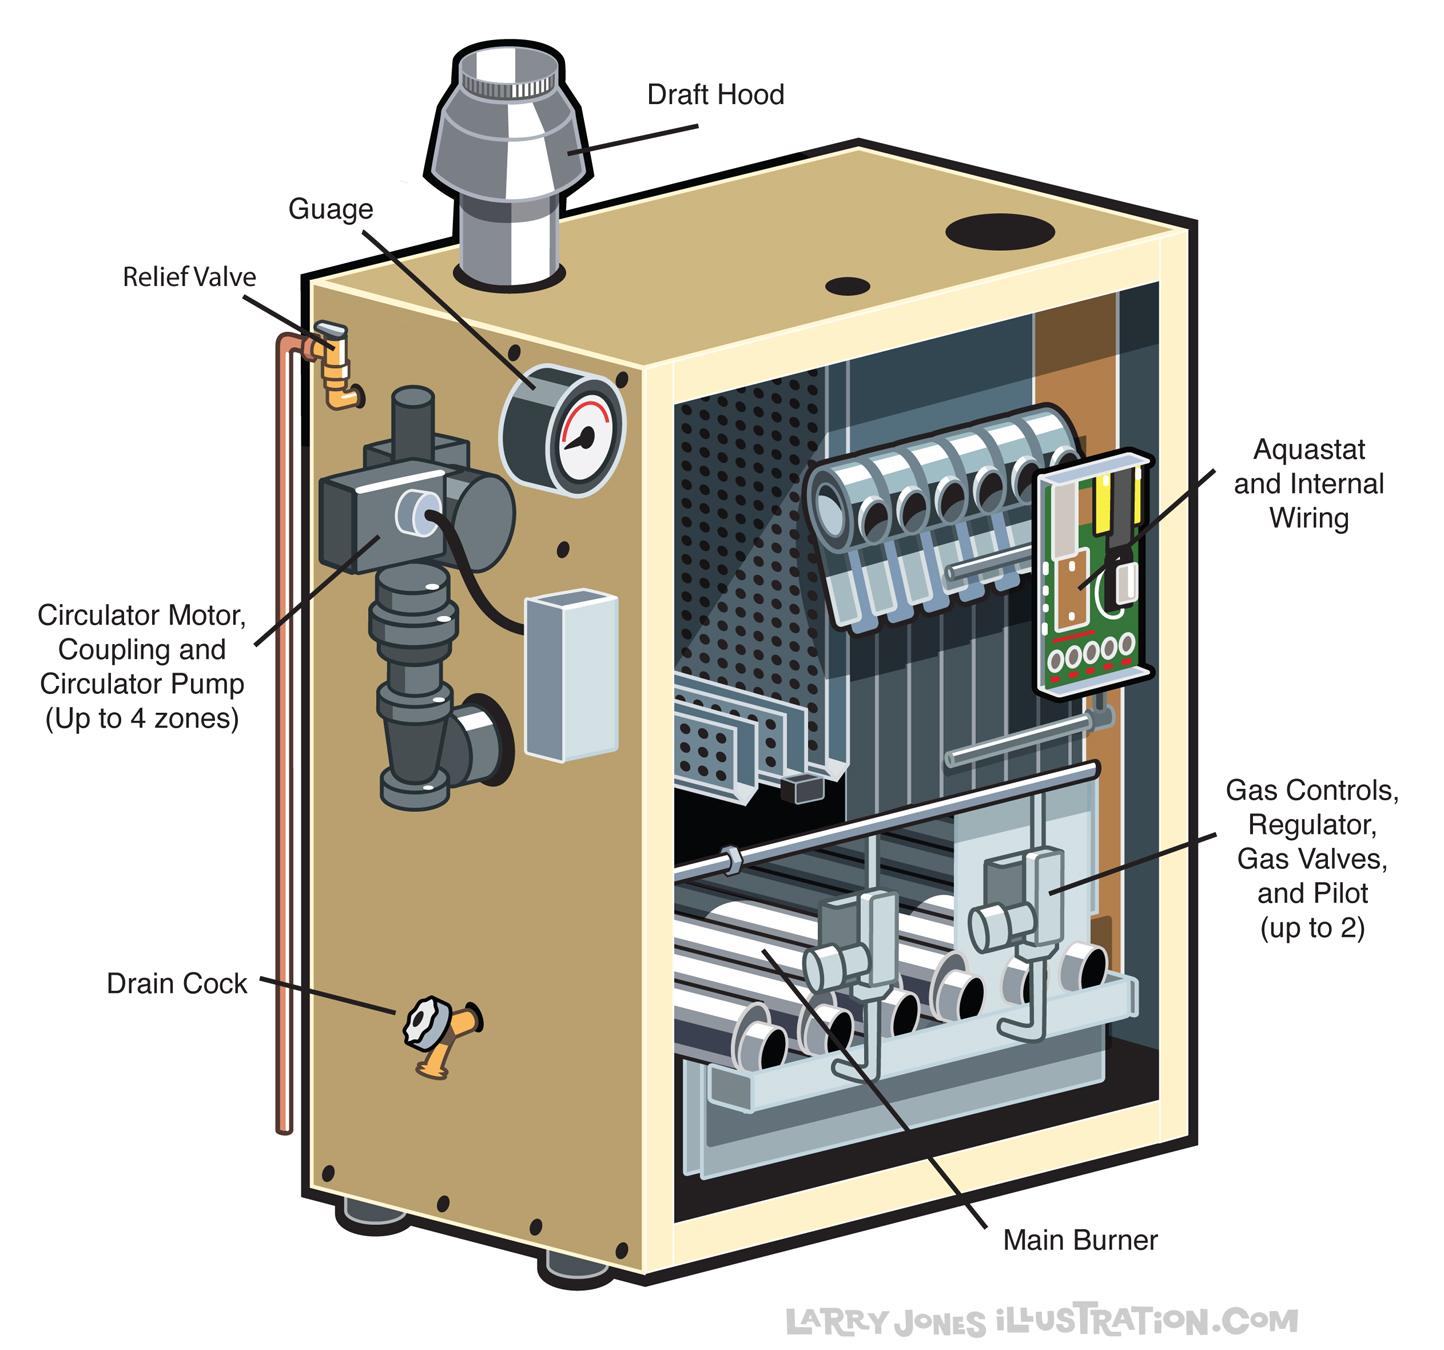 BGE-water-gas-illustration.jpg